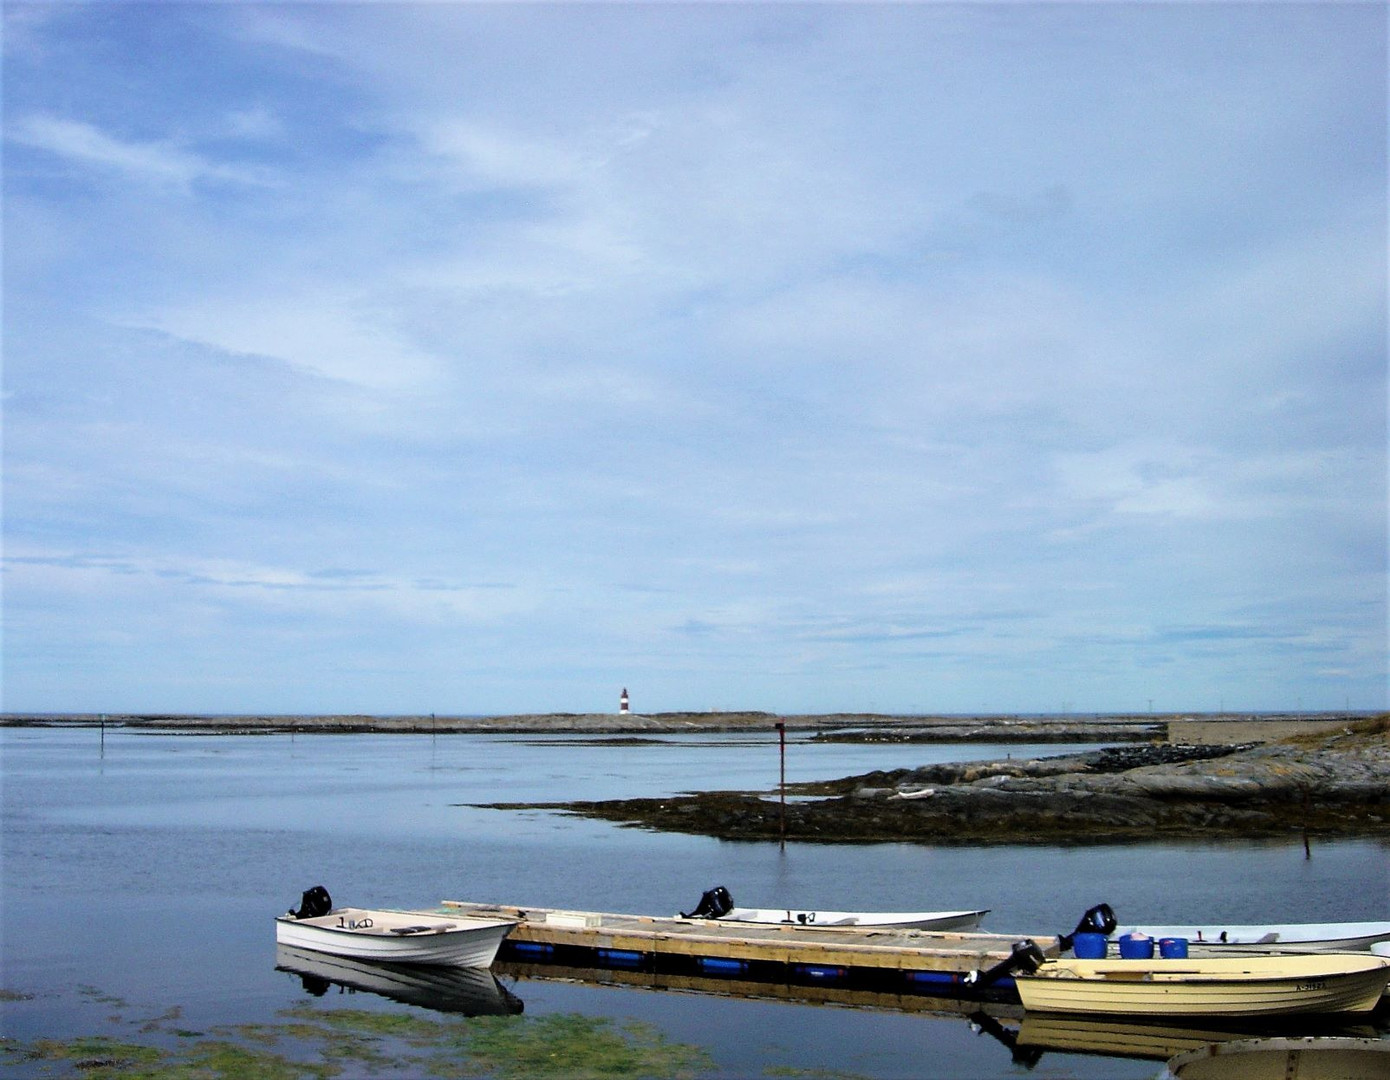 #502 båtar och fyr, norge